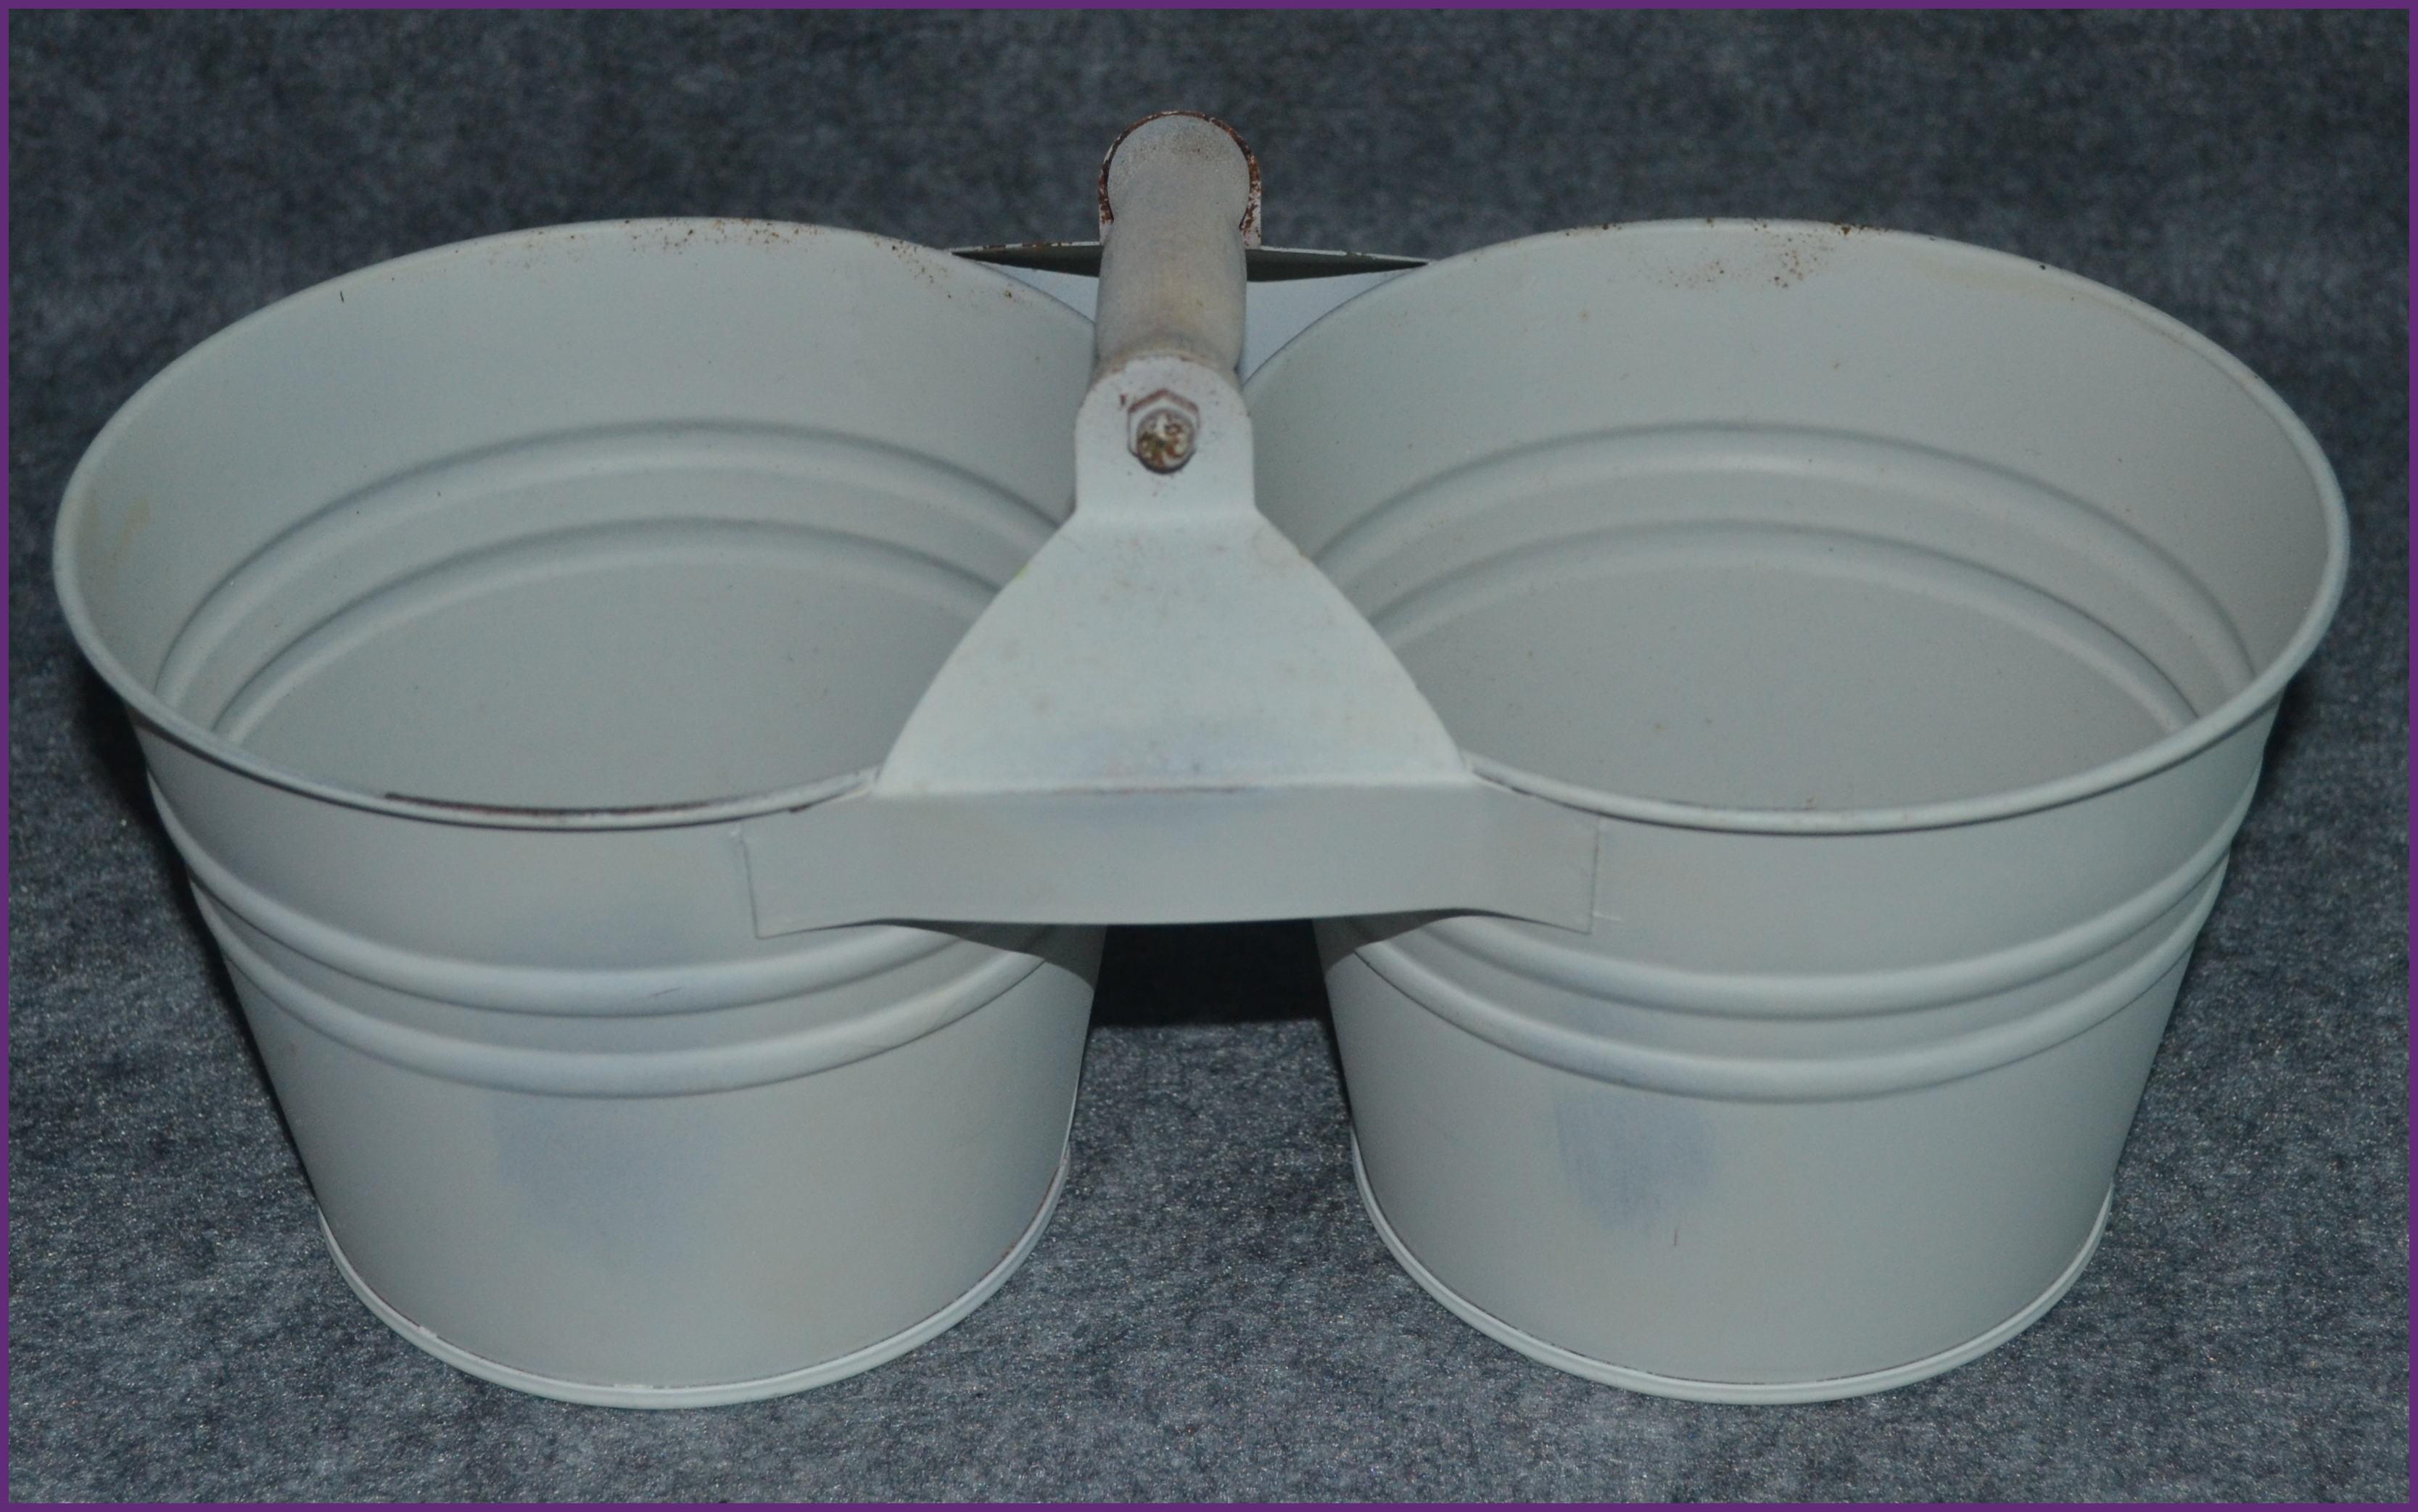 metal-white-metal-2-pot-holder-345001004-boarder.jpg